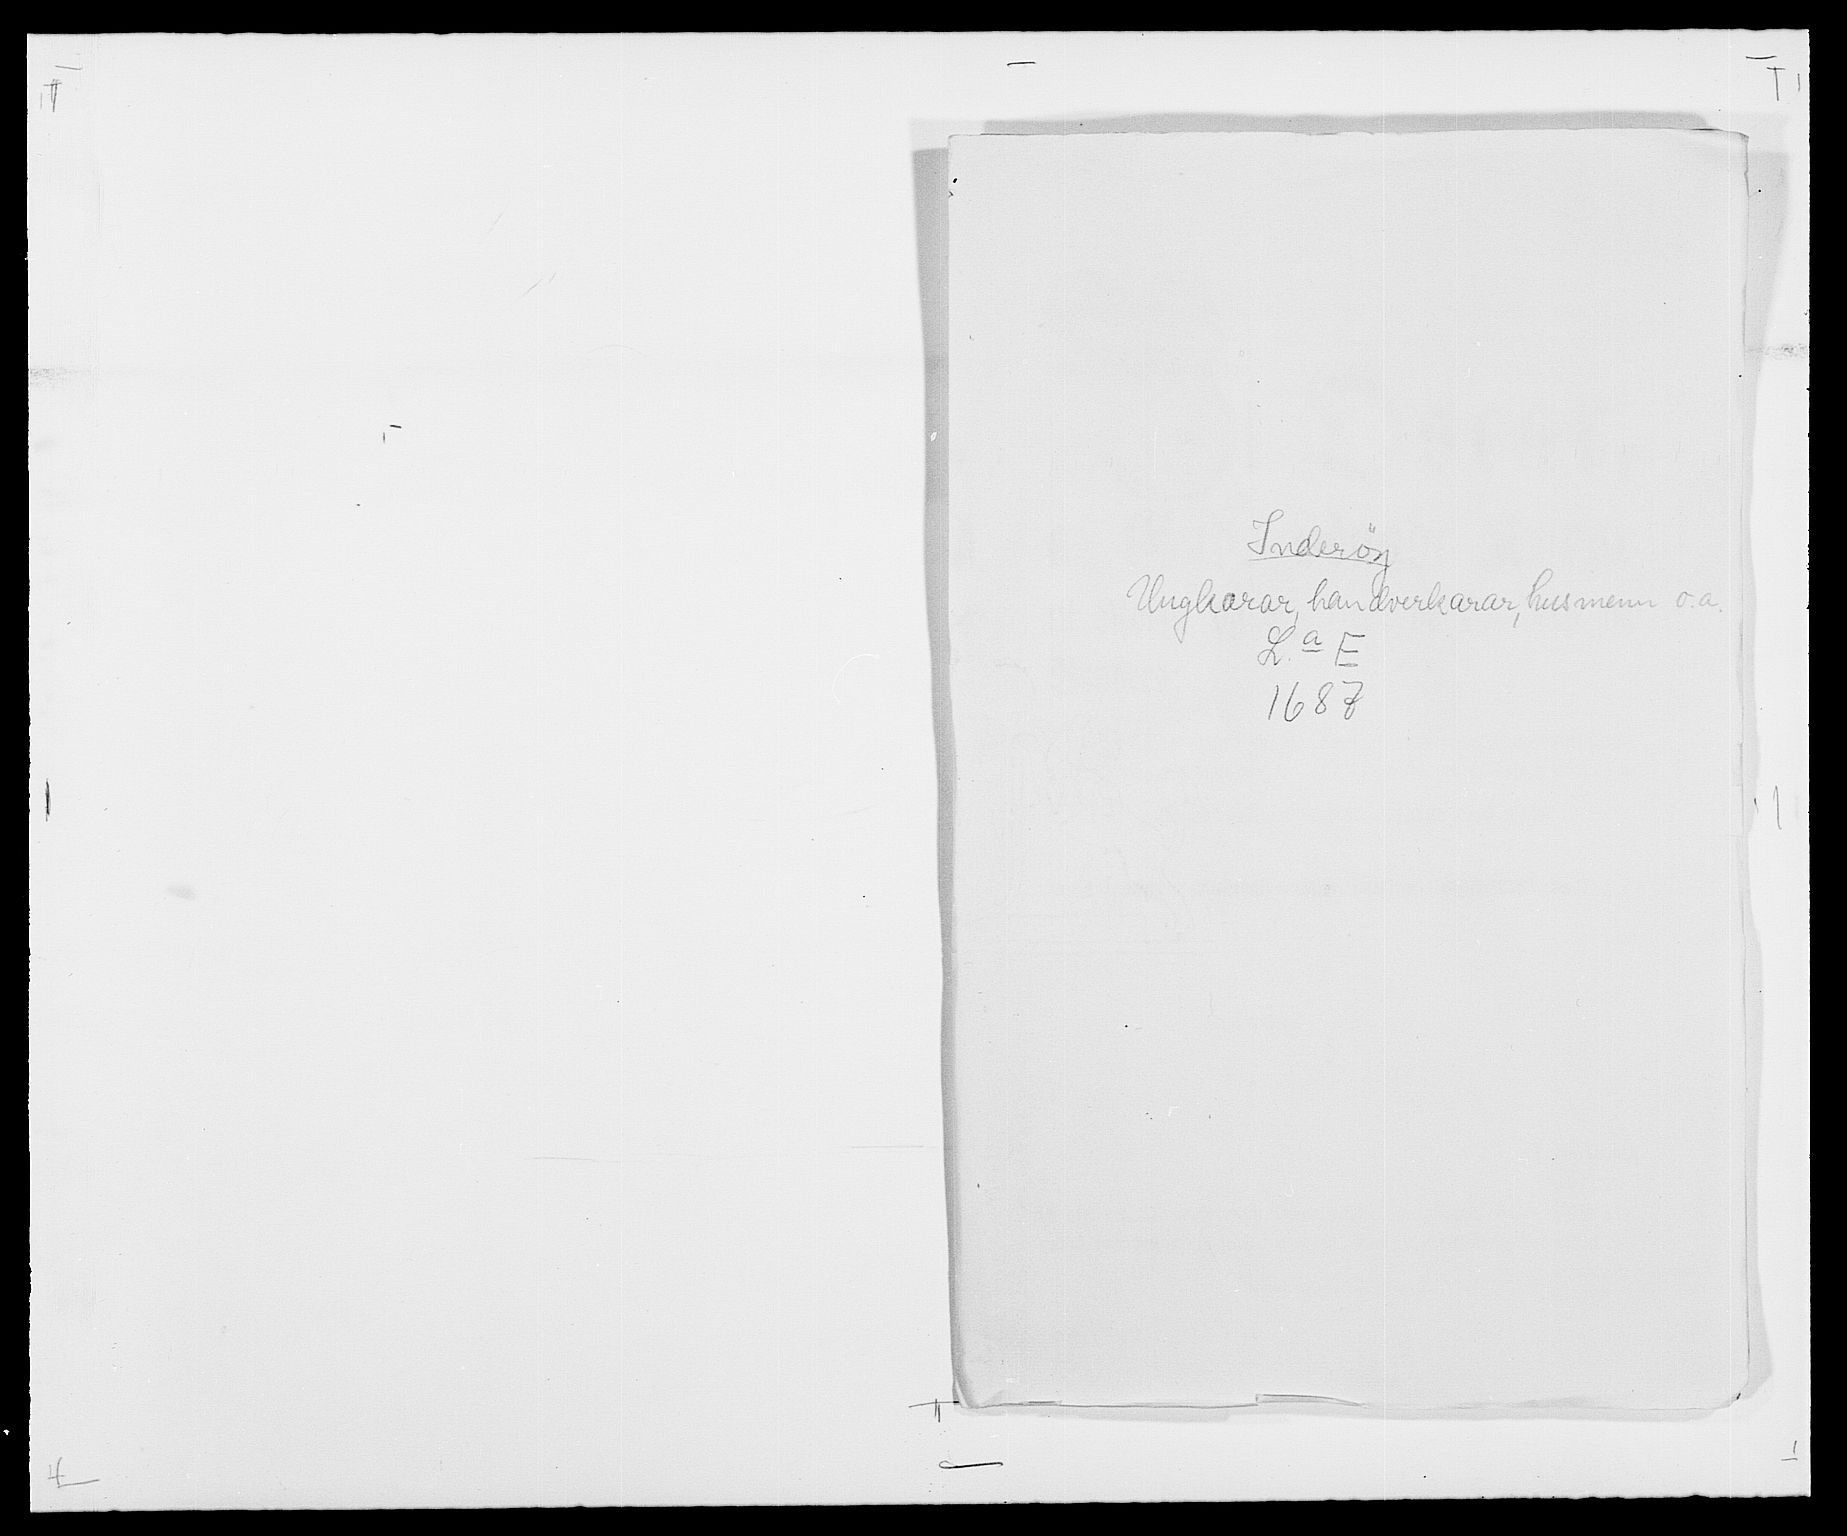 RA, Rentekammeret inntil 1814, Reviderte regnskaper, Fogderegnskap, R63/L4306: Fogderegnskap Inderøy, 1687-1689, s. 89